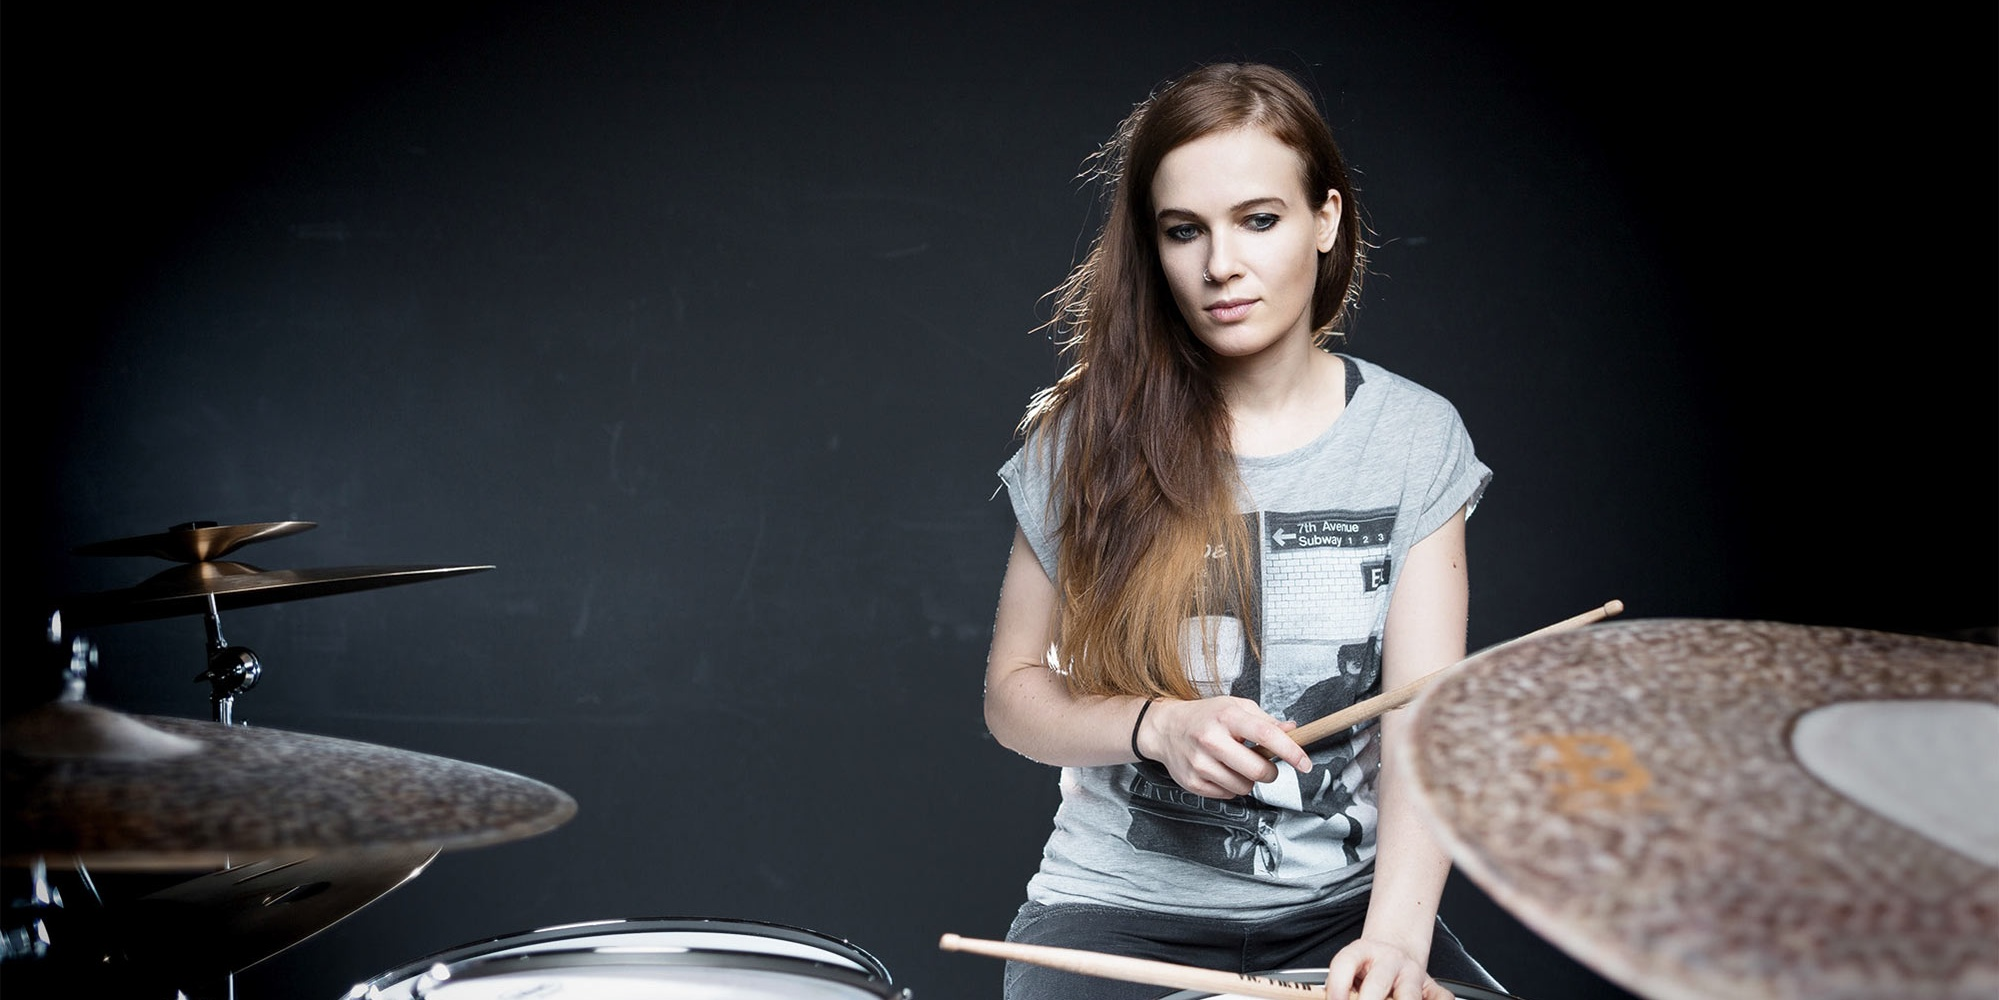 Drummer Anika Nilles to host masterclass at The Star Vista